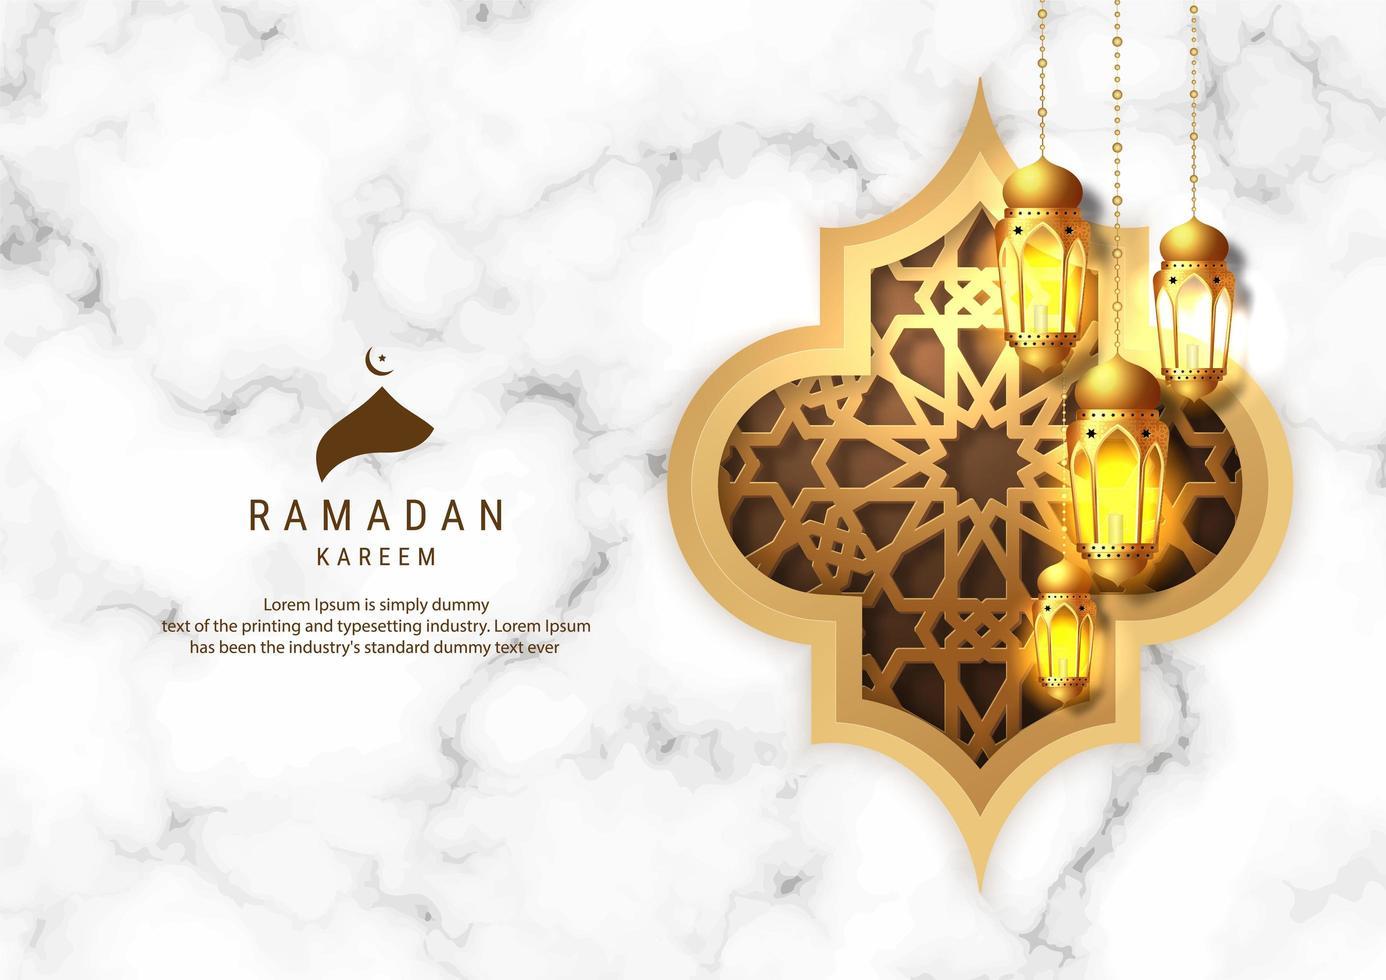 Lanterne Ramadan Kareem su sfondo di marmo bianco vettore